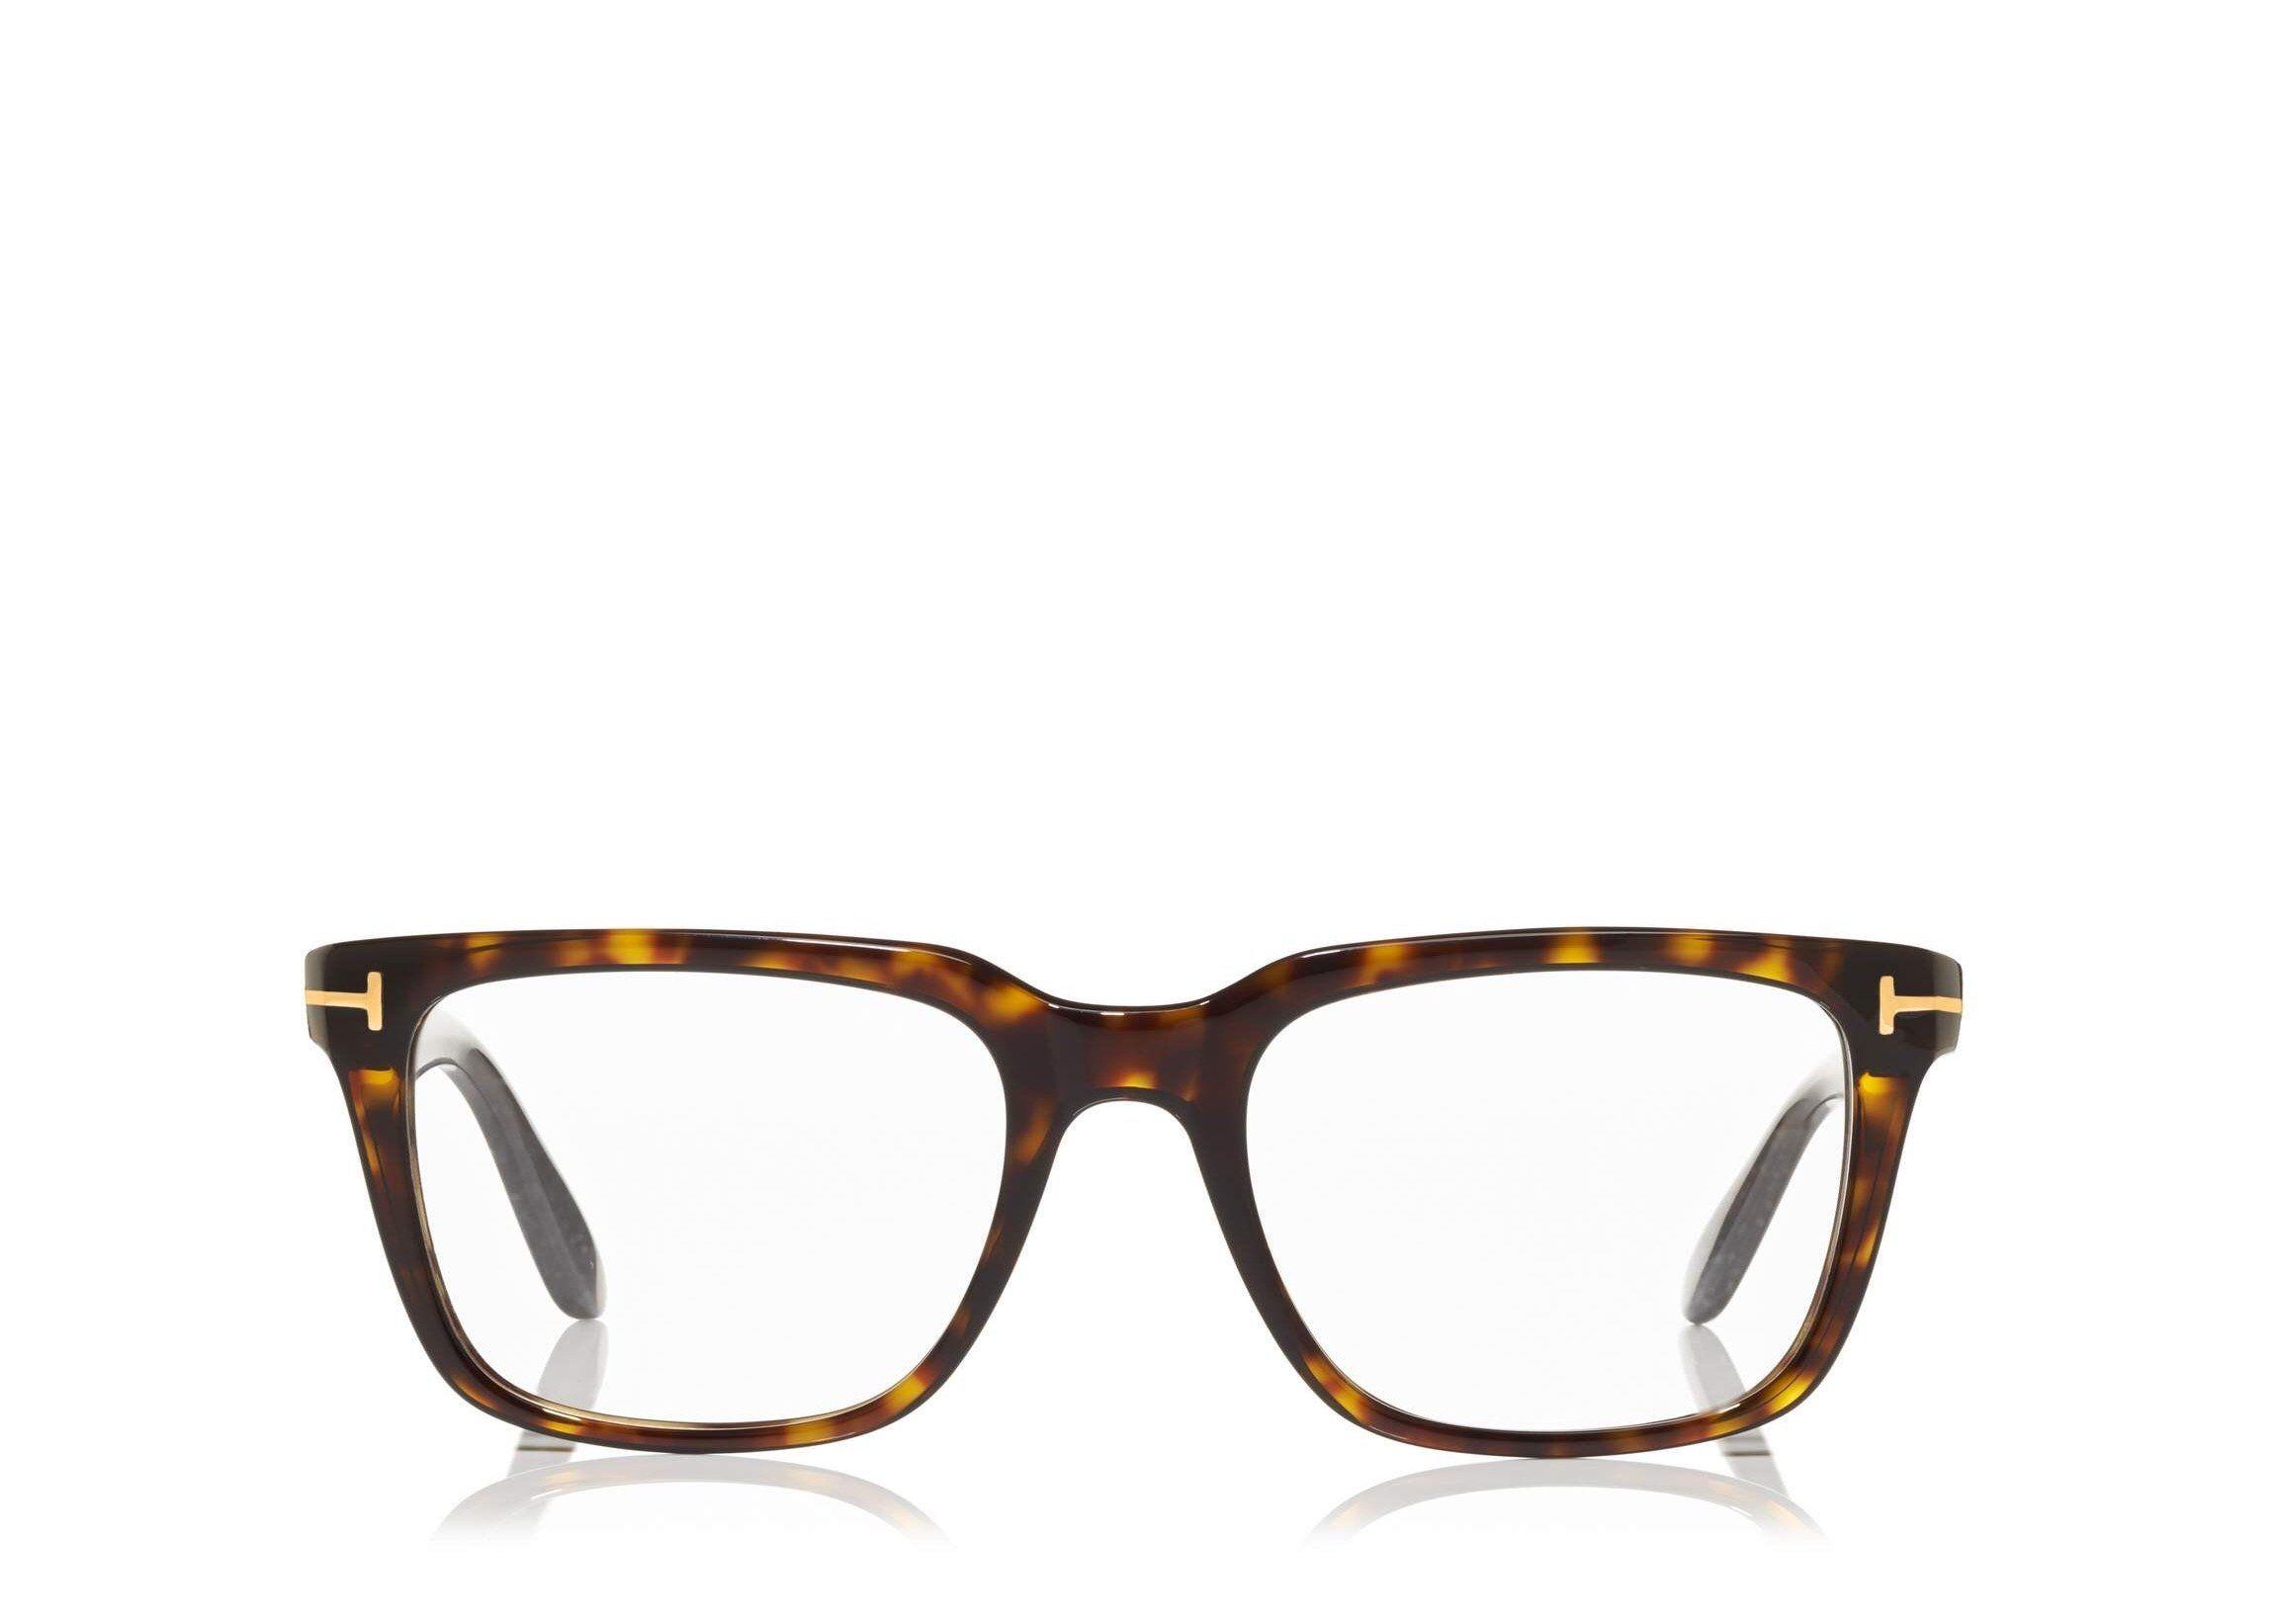 f2c335ed7d FT-5304 Men s Square-Frame Acetate Optical Glasses